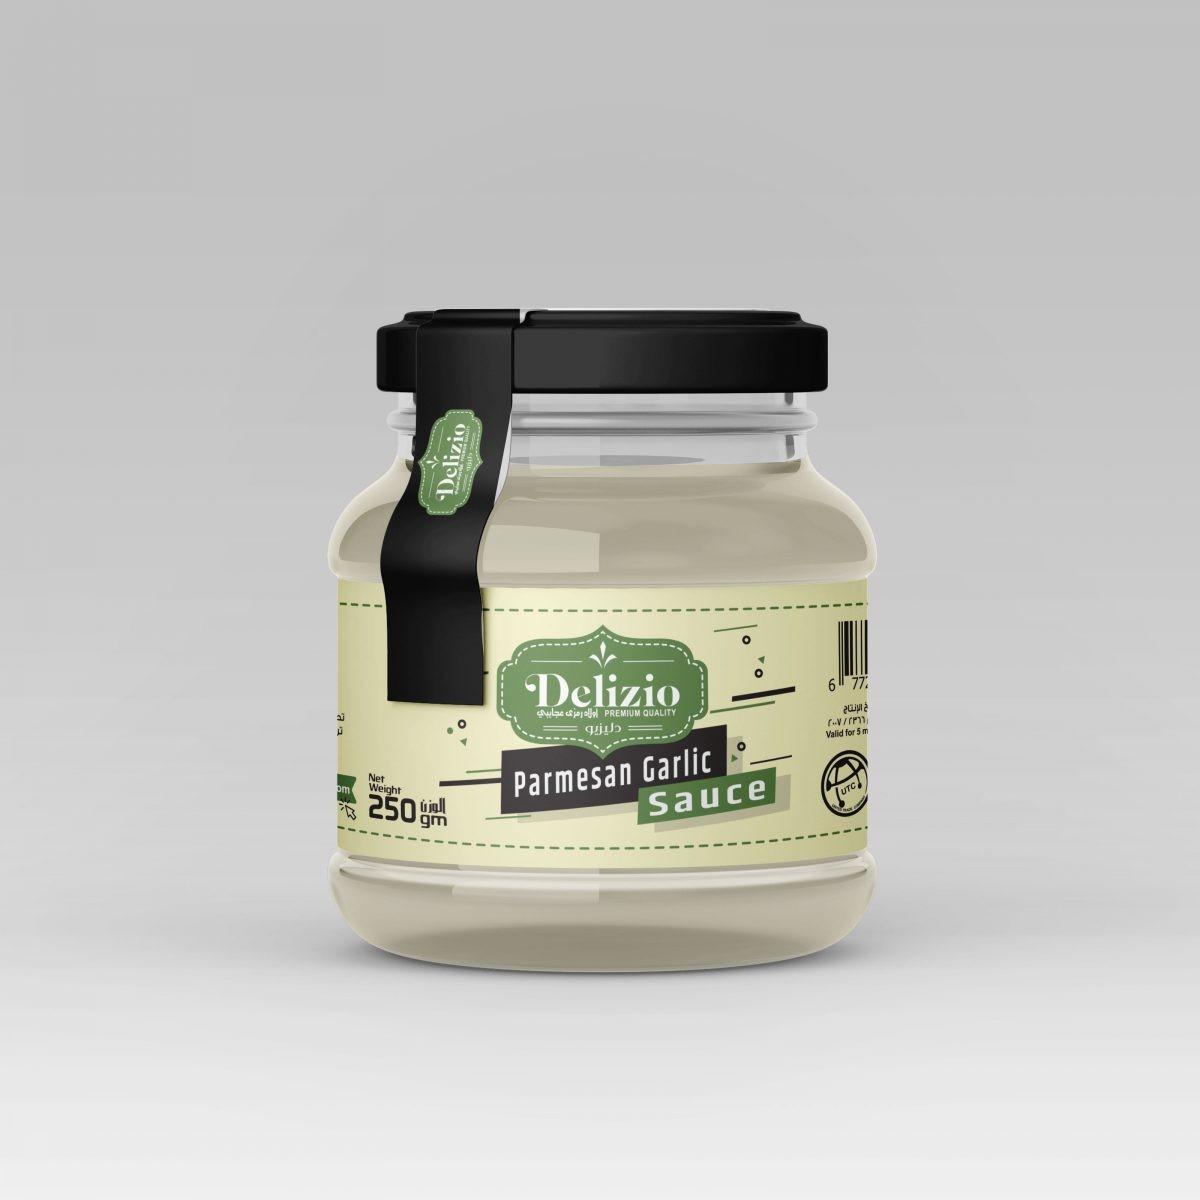 Parmesan Garlic Sauce